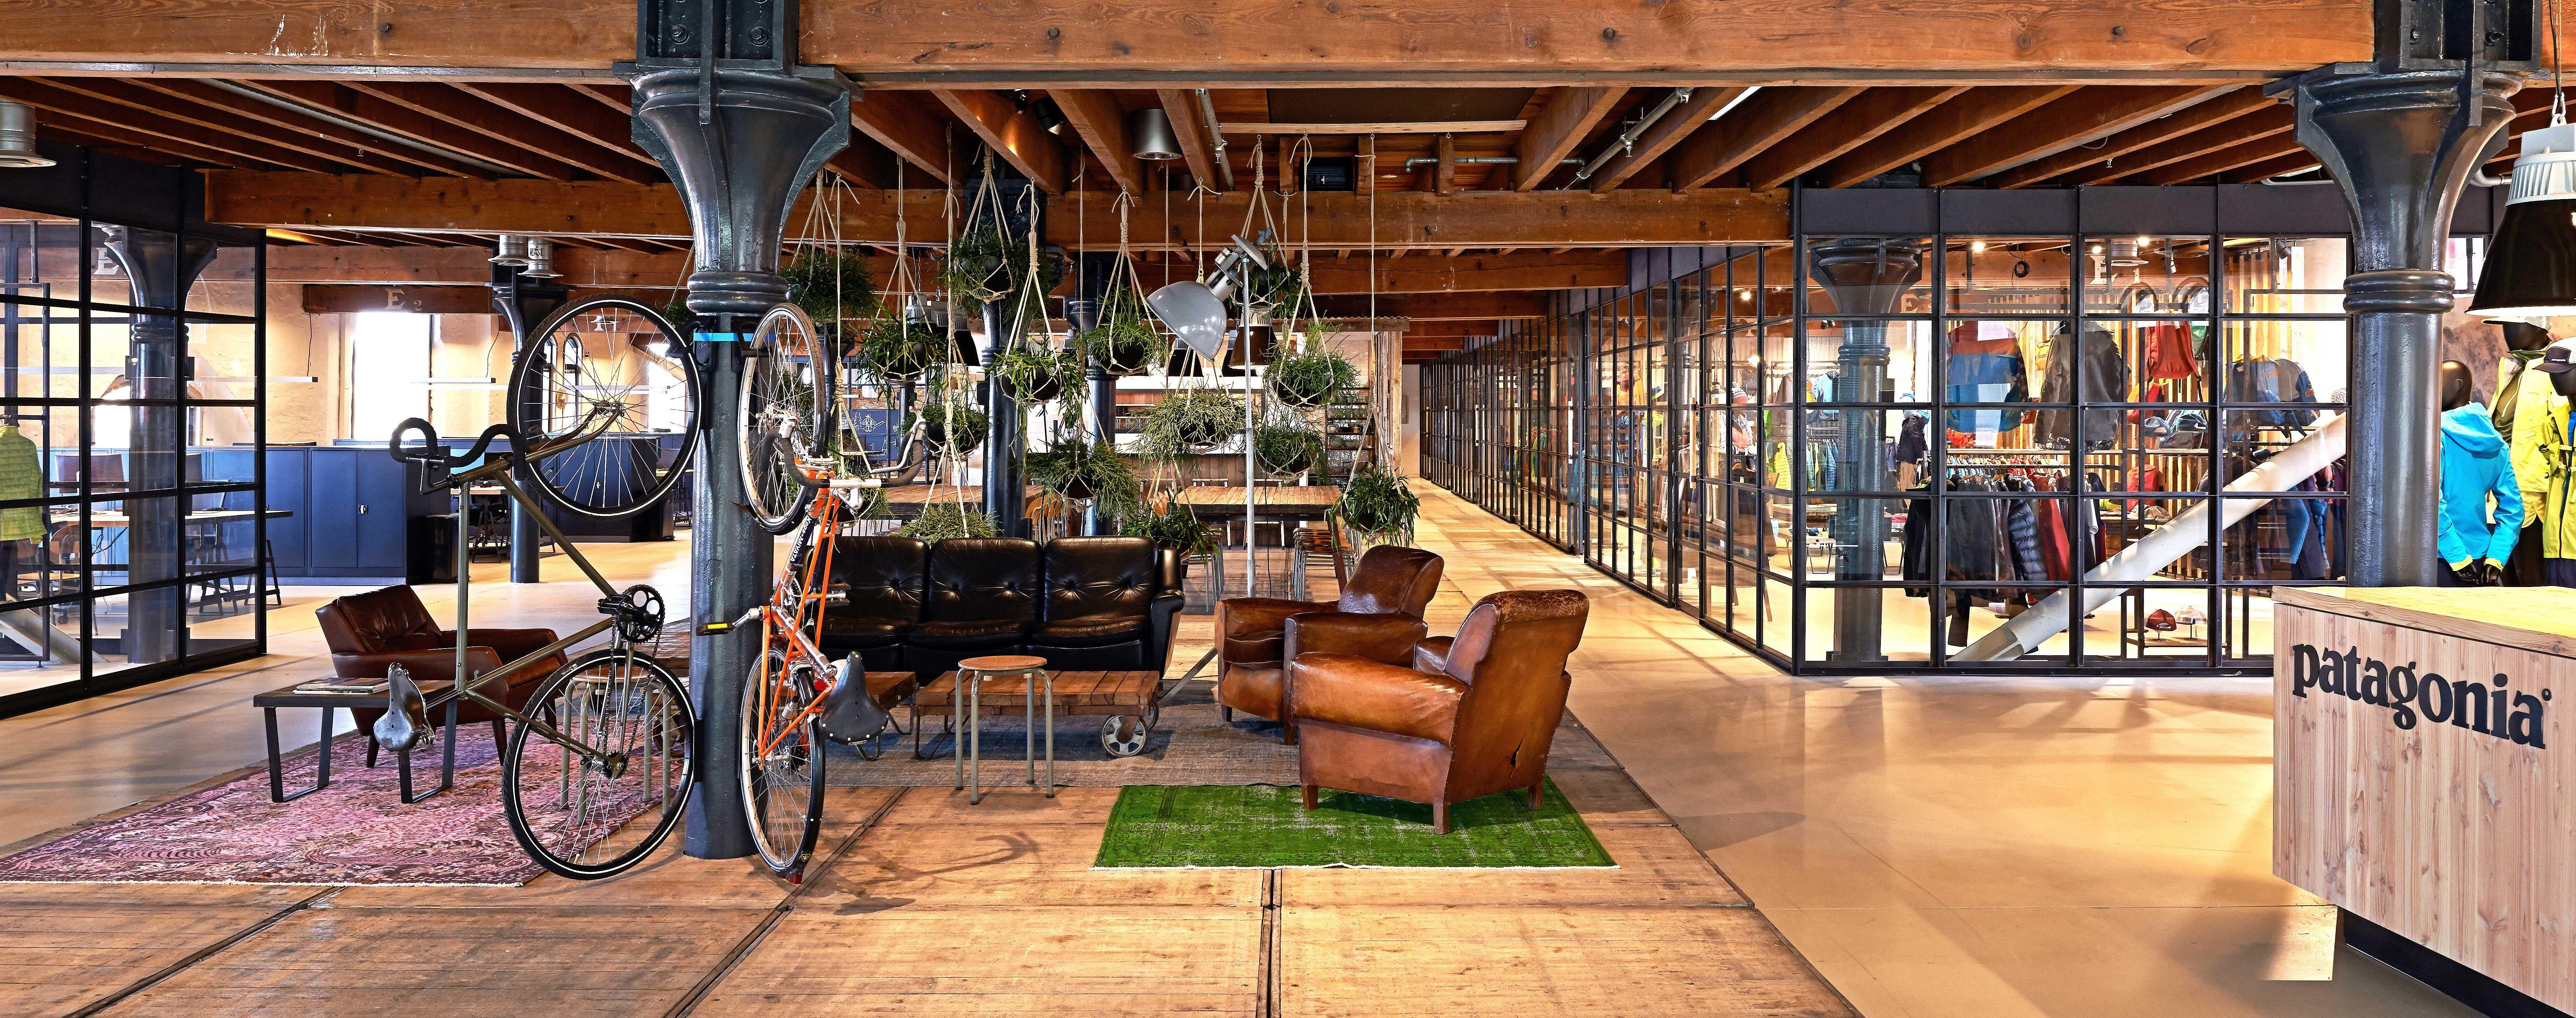 75 interior design firms amsterdam amsterdam based for Design agencies amsterdam